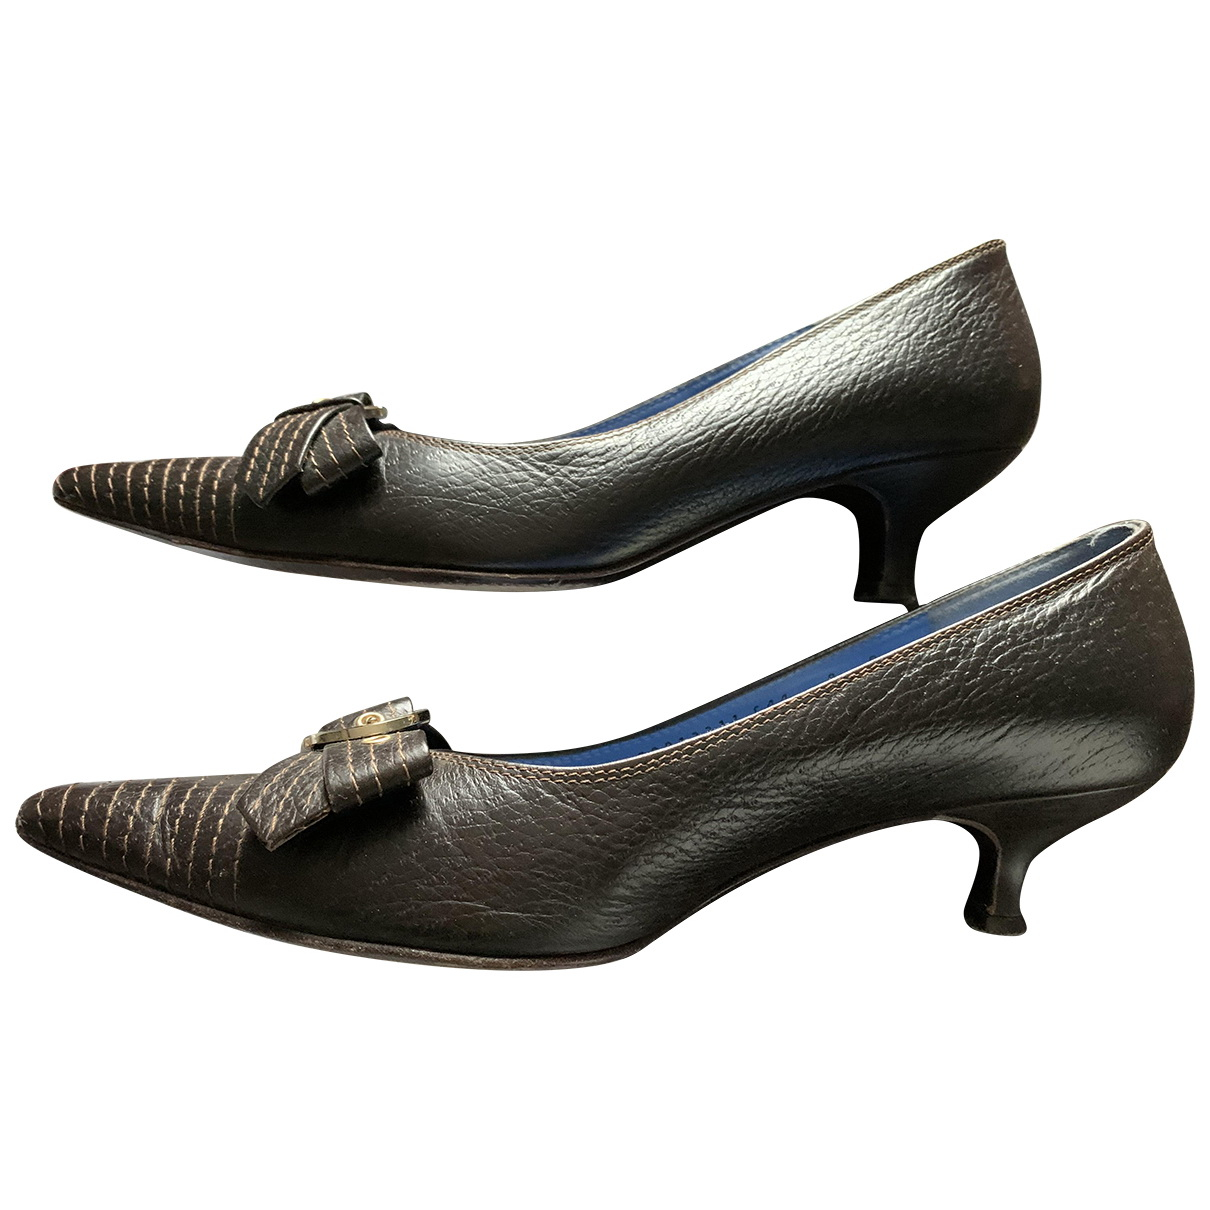 Salvatore Ferragamo N Brown Leather Heels for Women 38 EU